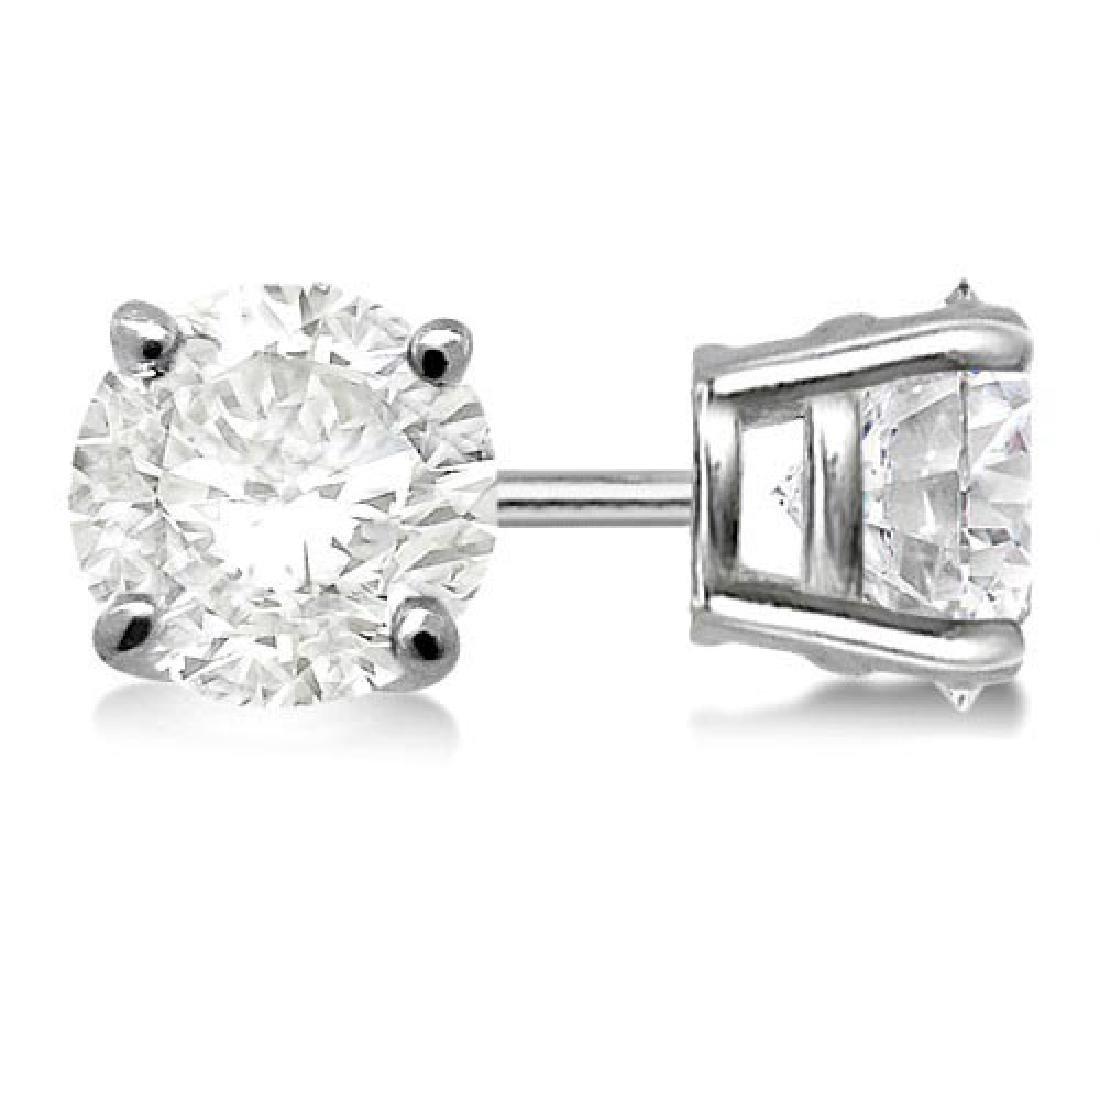 Certified 1.4 CTW Round Diamond Stud Earrings J/SI2